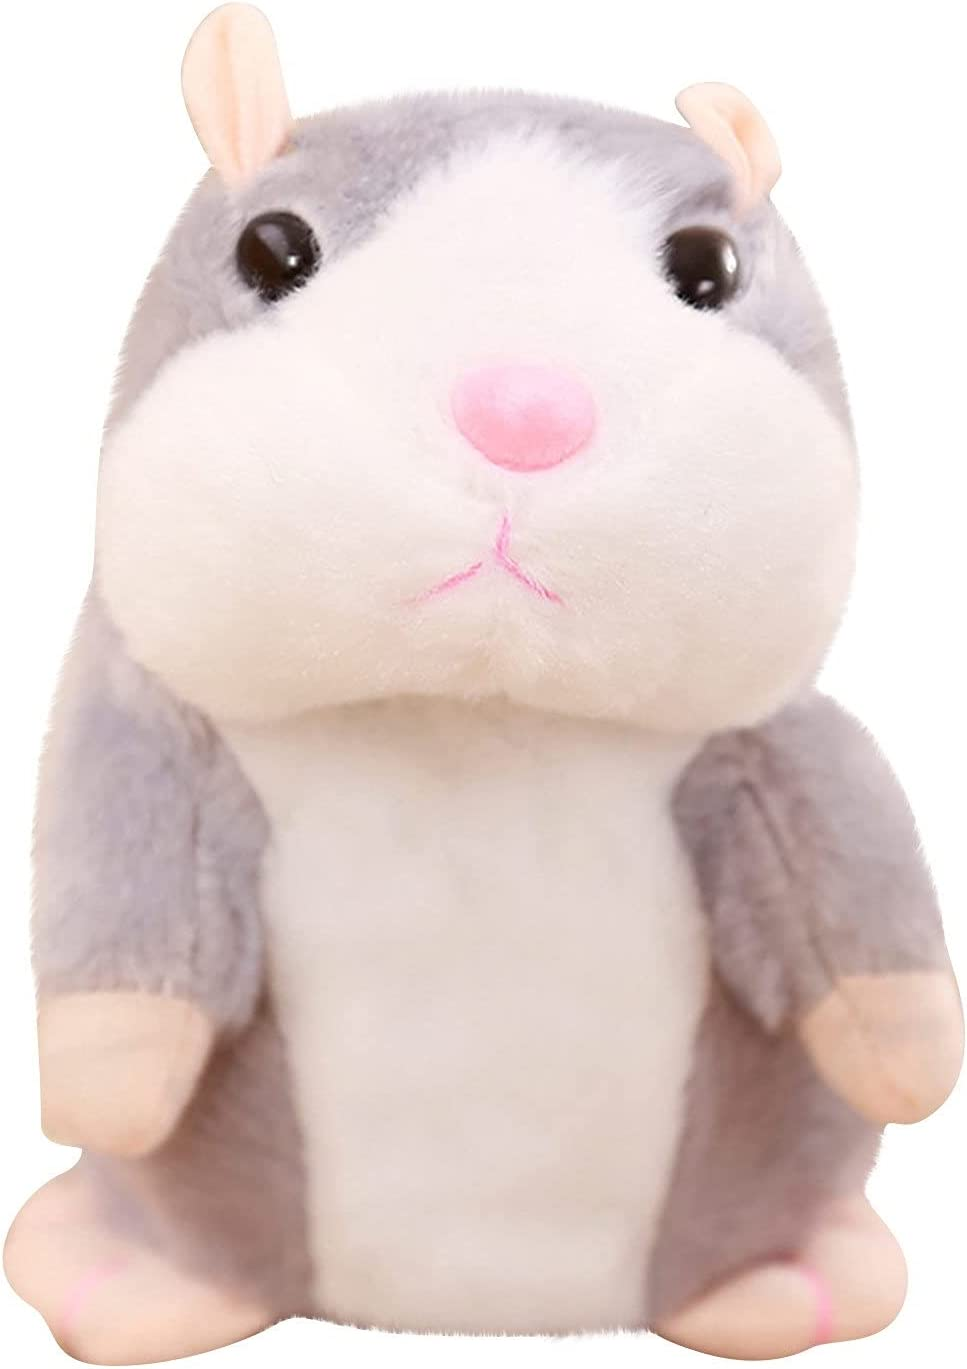 ENHONGDZ Mouse Pet Plush Toy Hot Sound Ranking integrated 1st place Speak Cute Limited price sale Talking Record